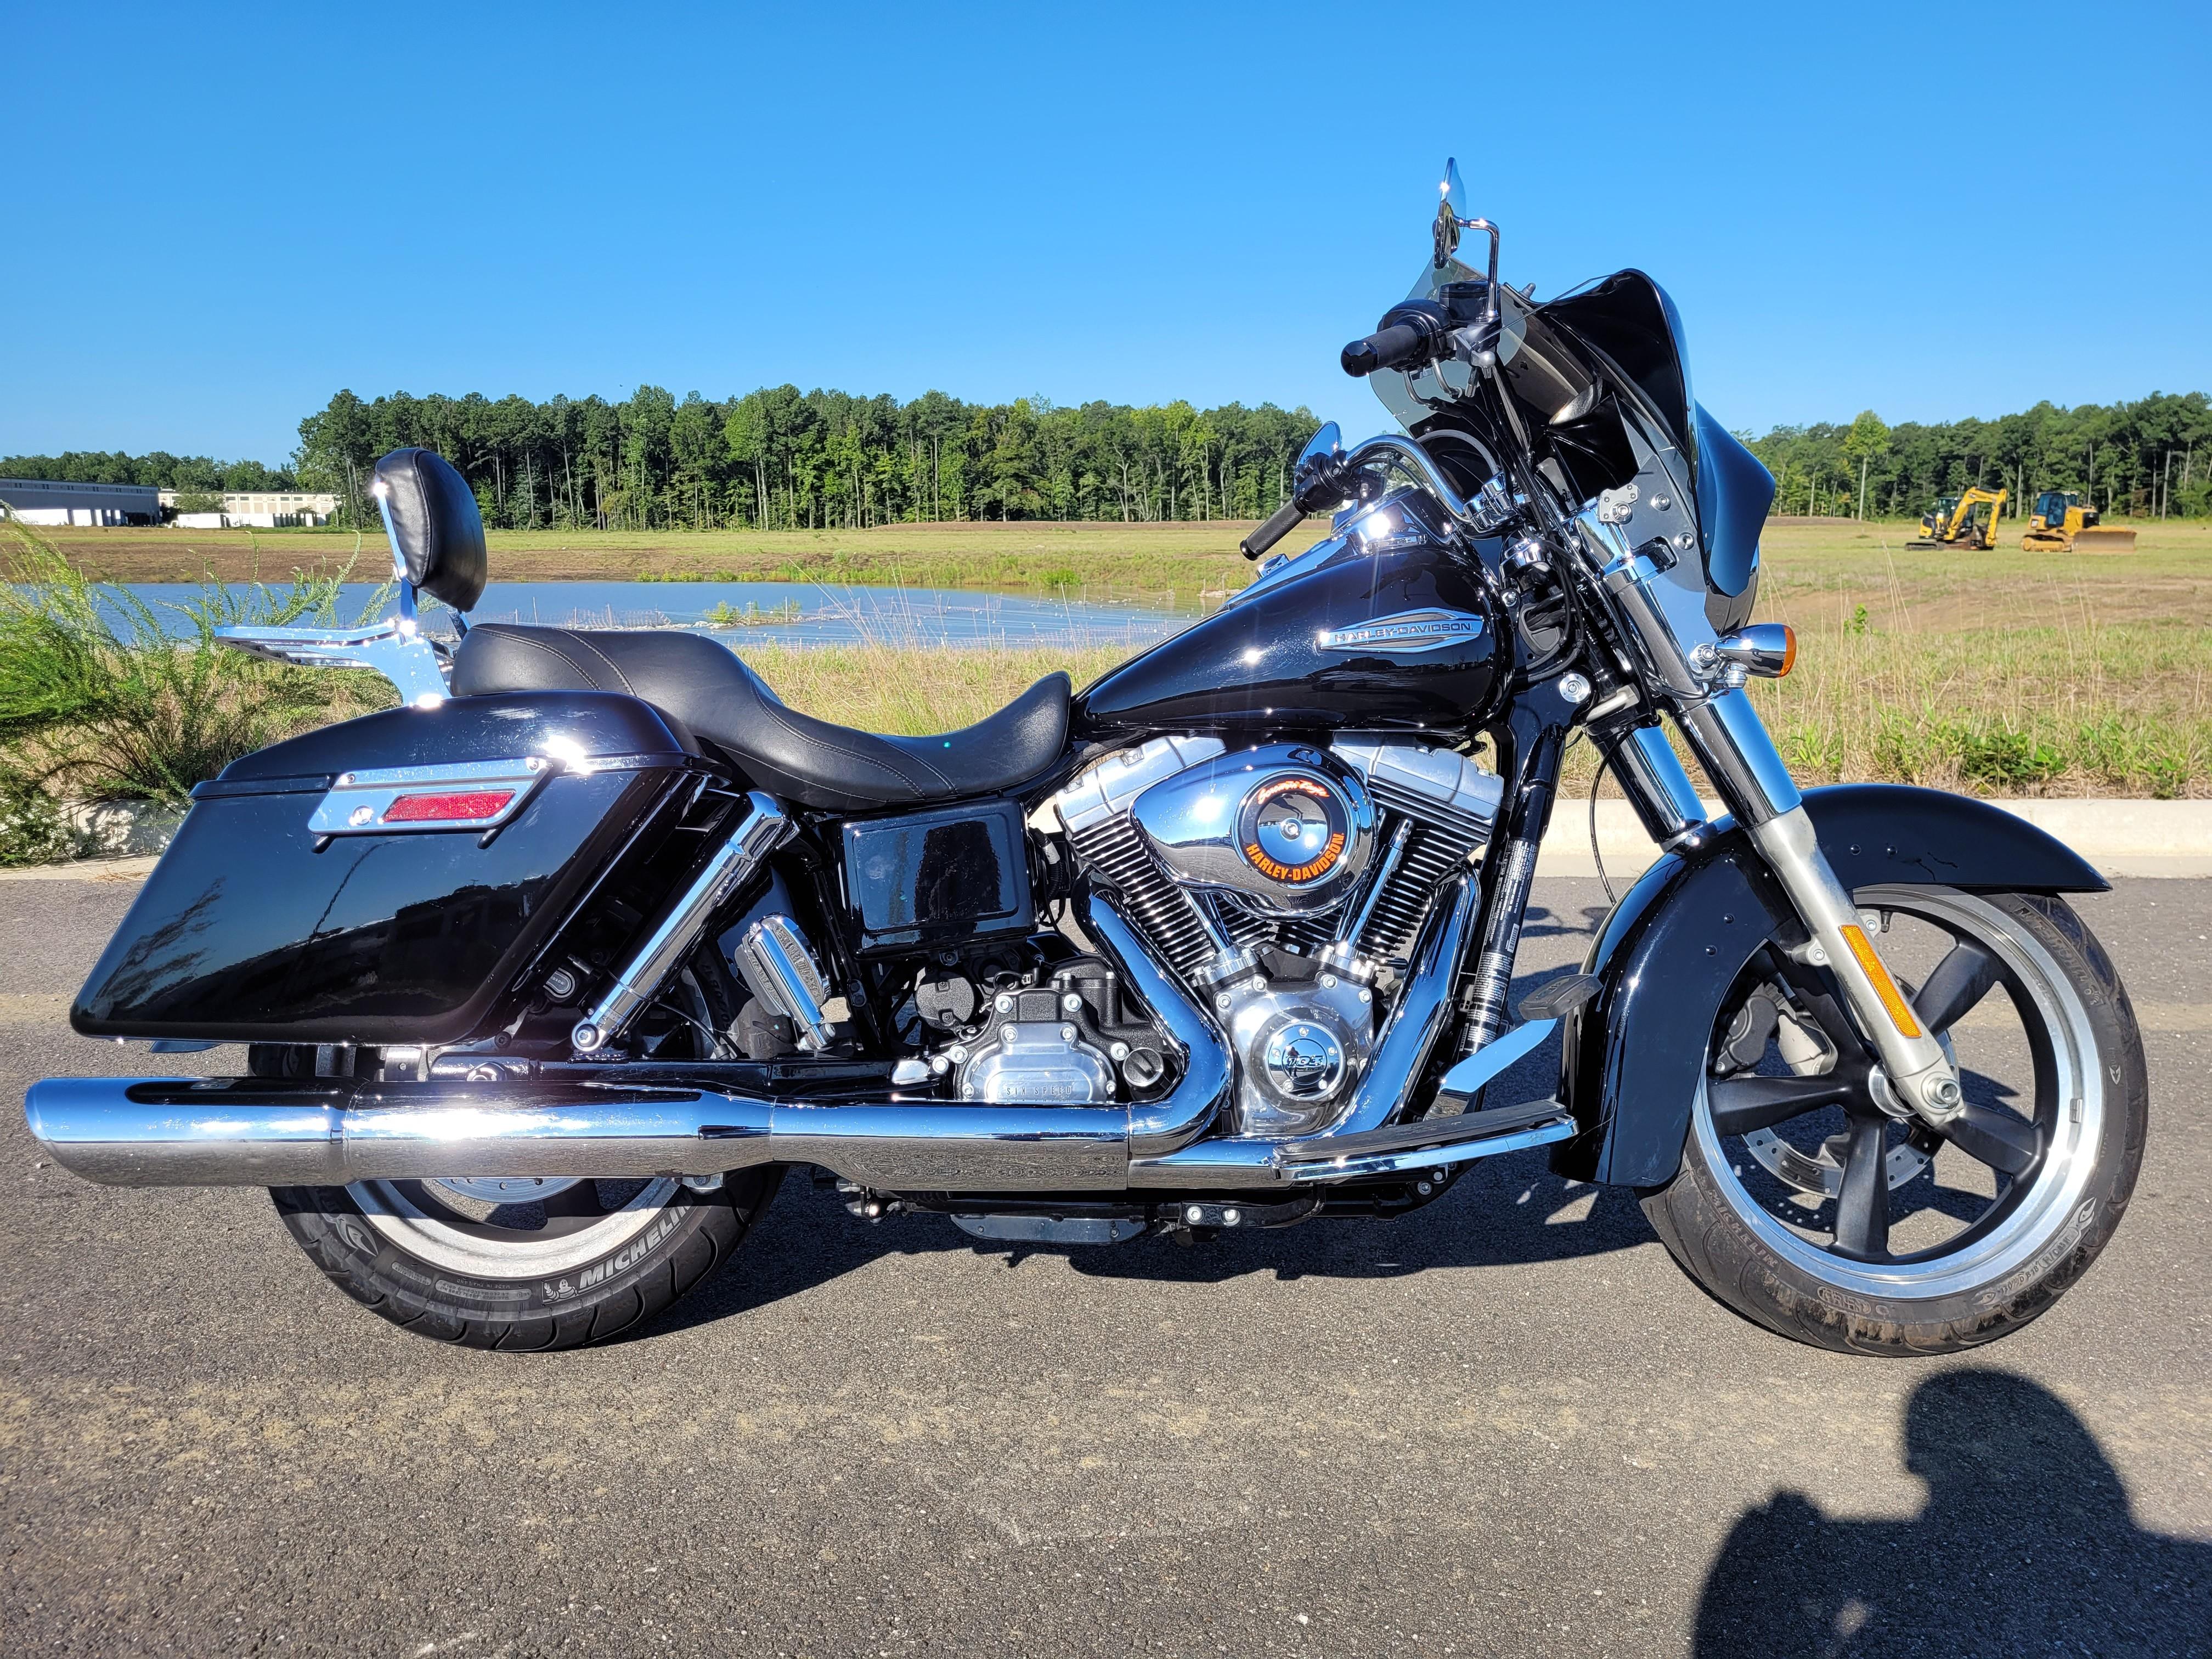 2013 Harley-Davidson Dyna Switchback at Richmond Harley-Davidson